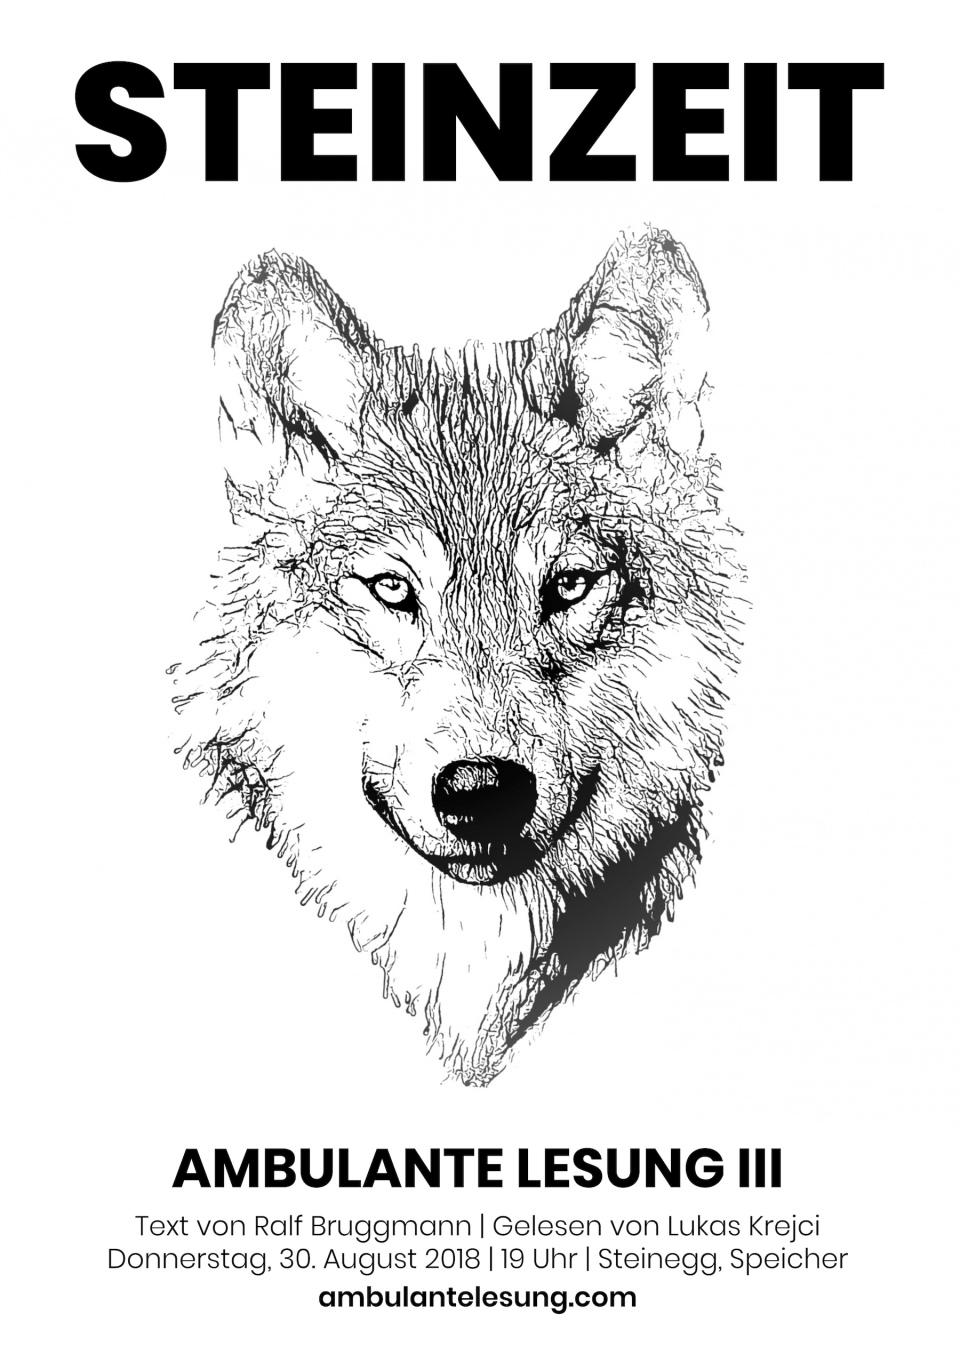 Ambulante Lesung 3 - Flyer - Seite 1